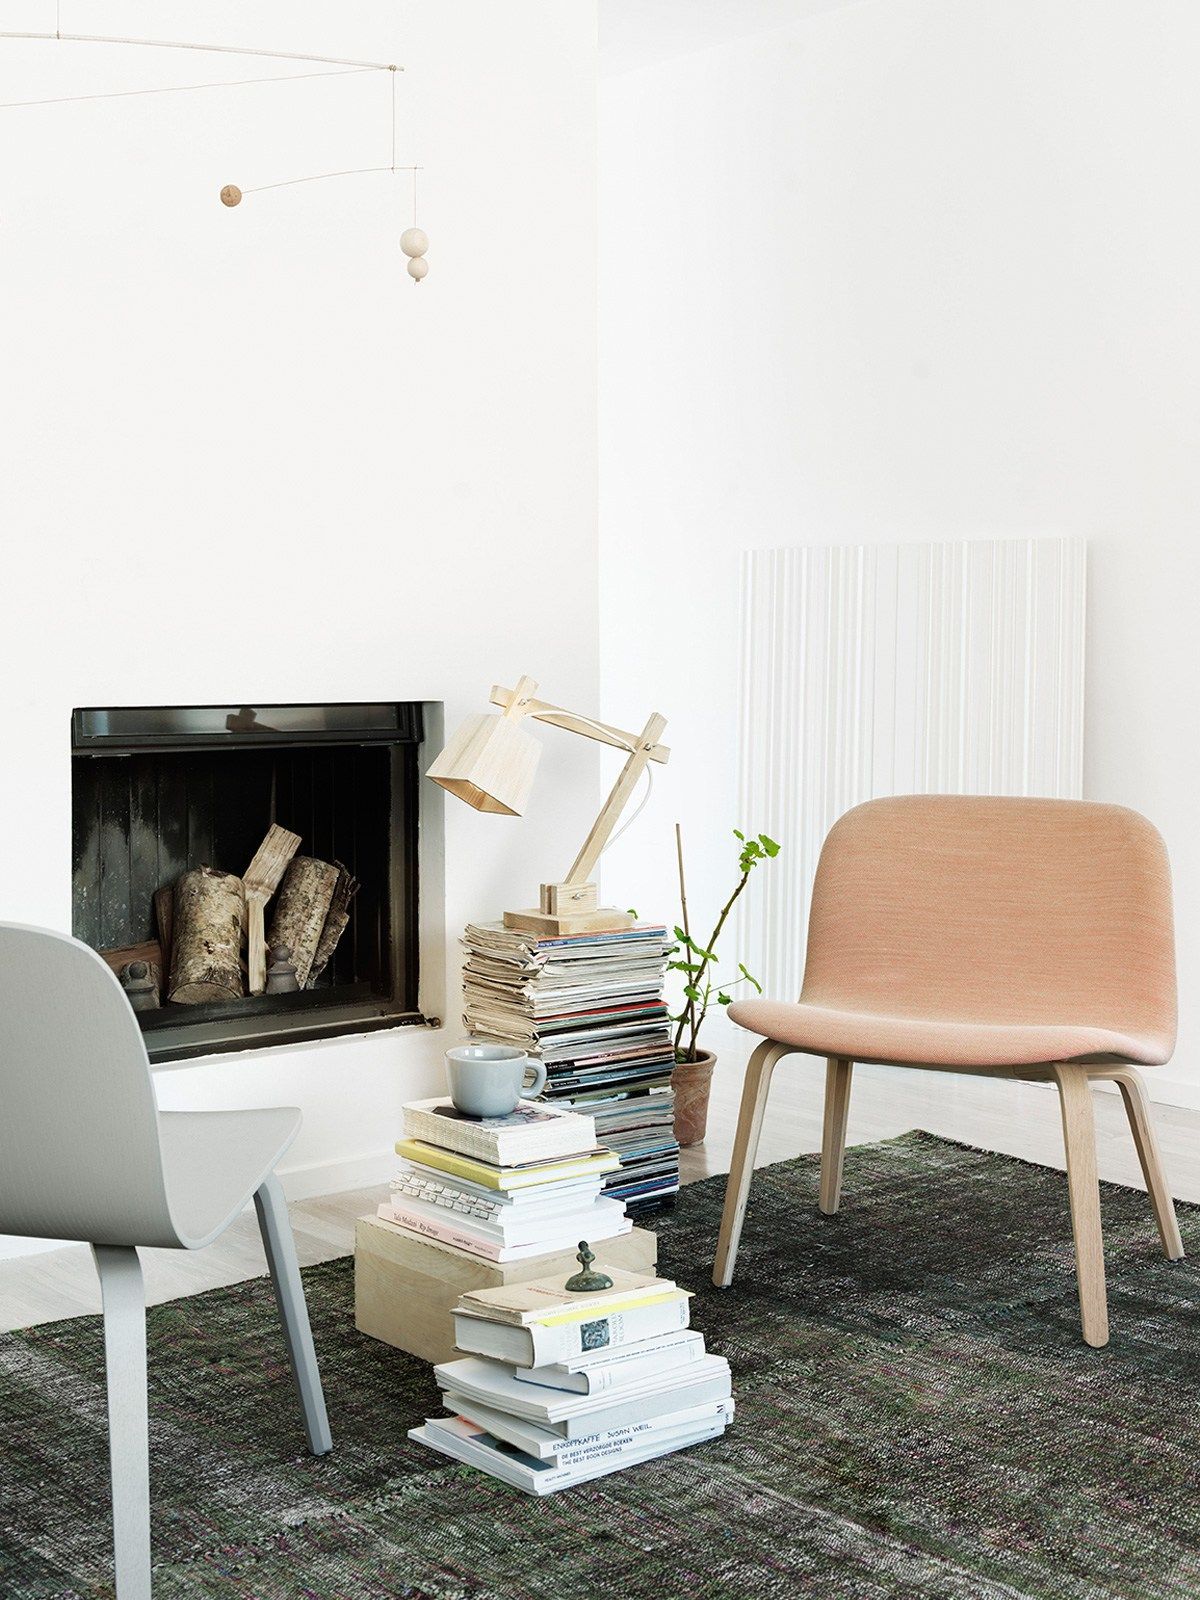 Delightful Explore Nordic Design, Scandinavian Design And More!